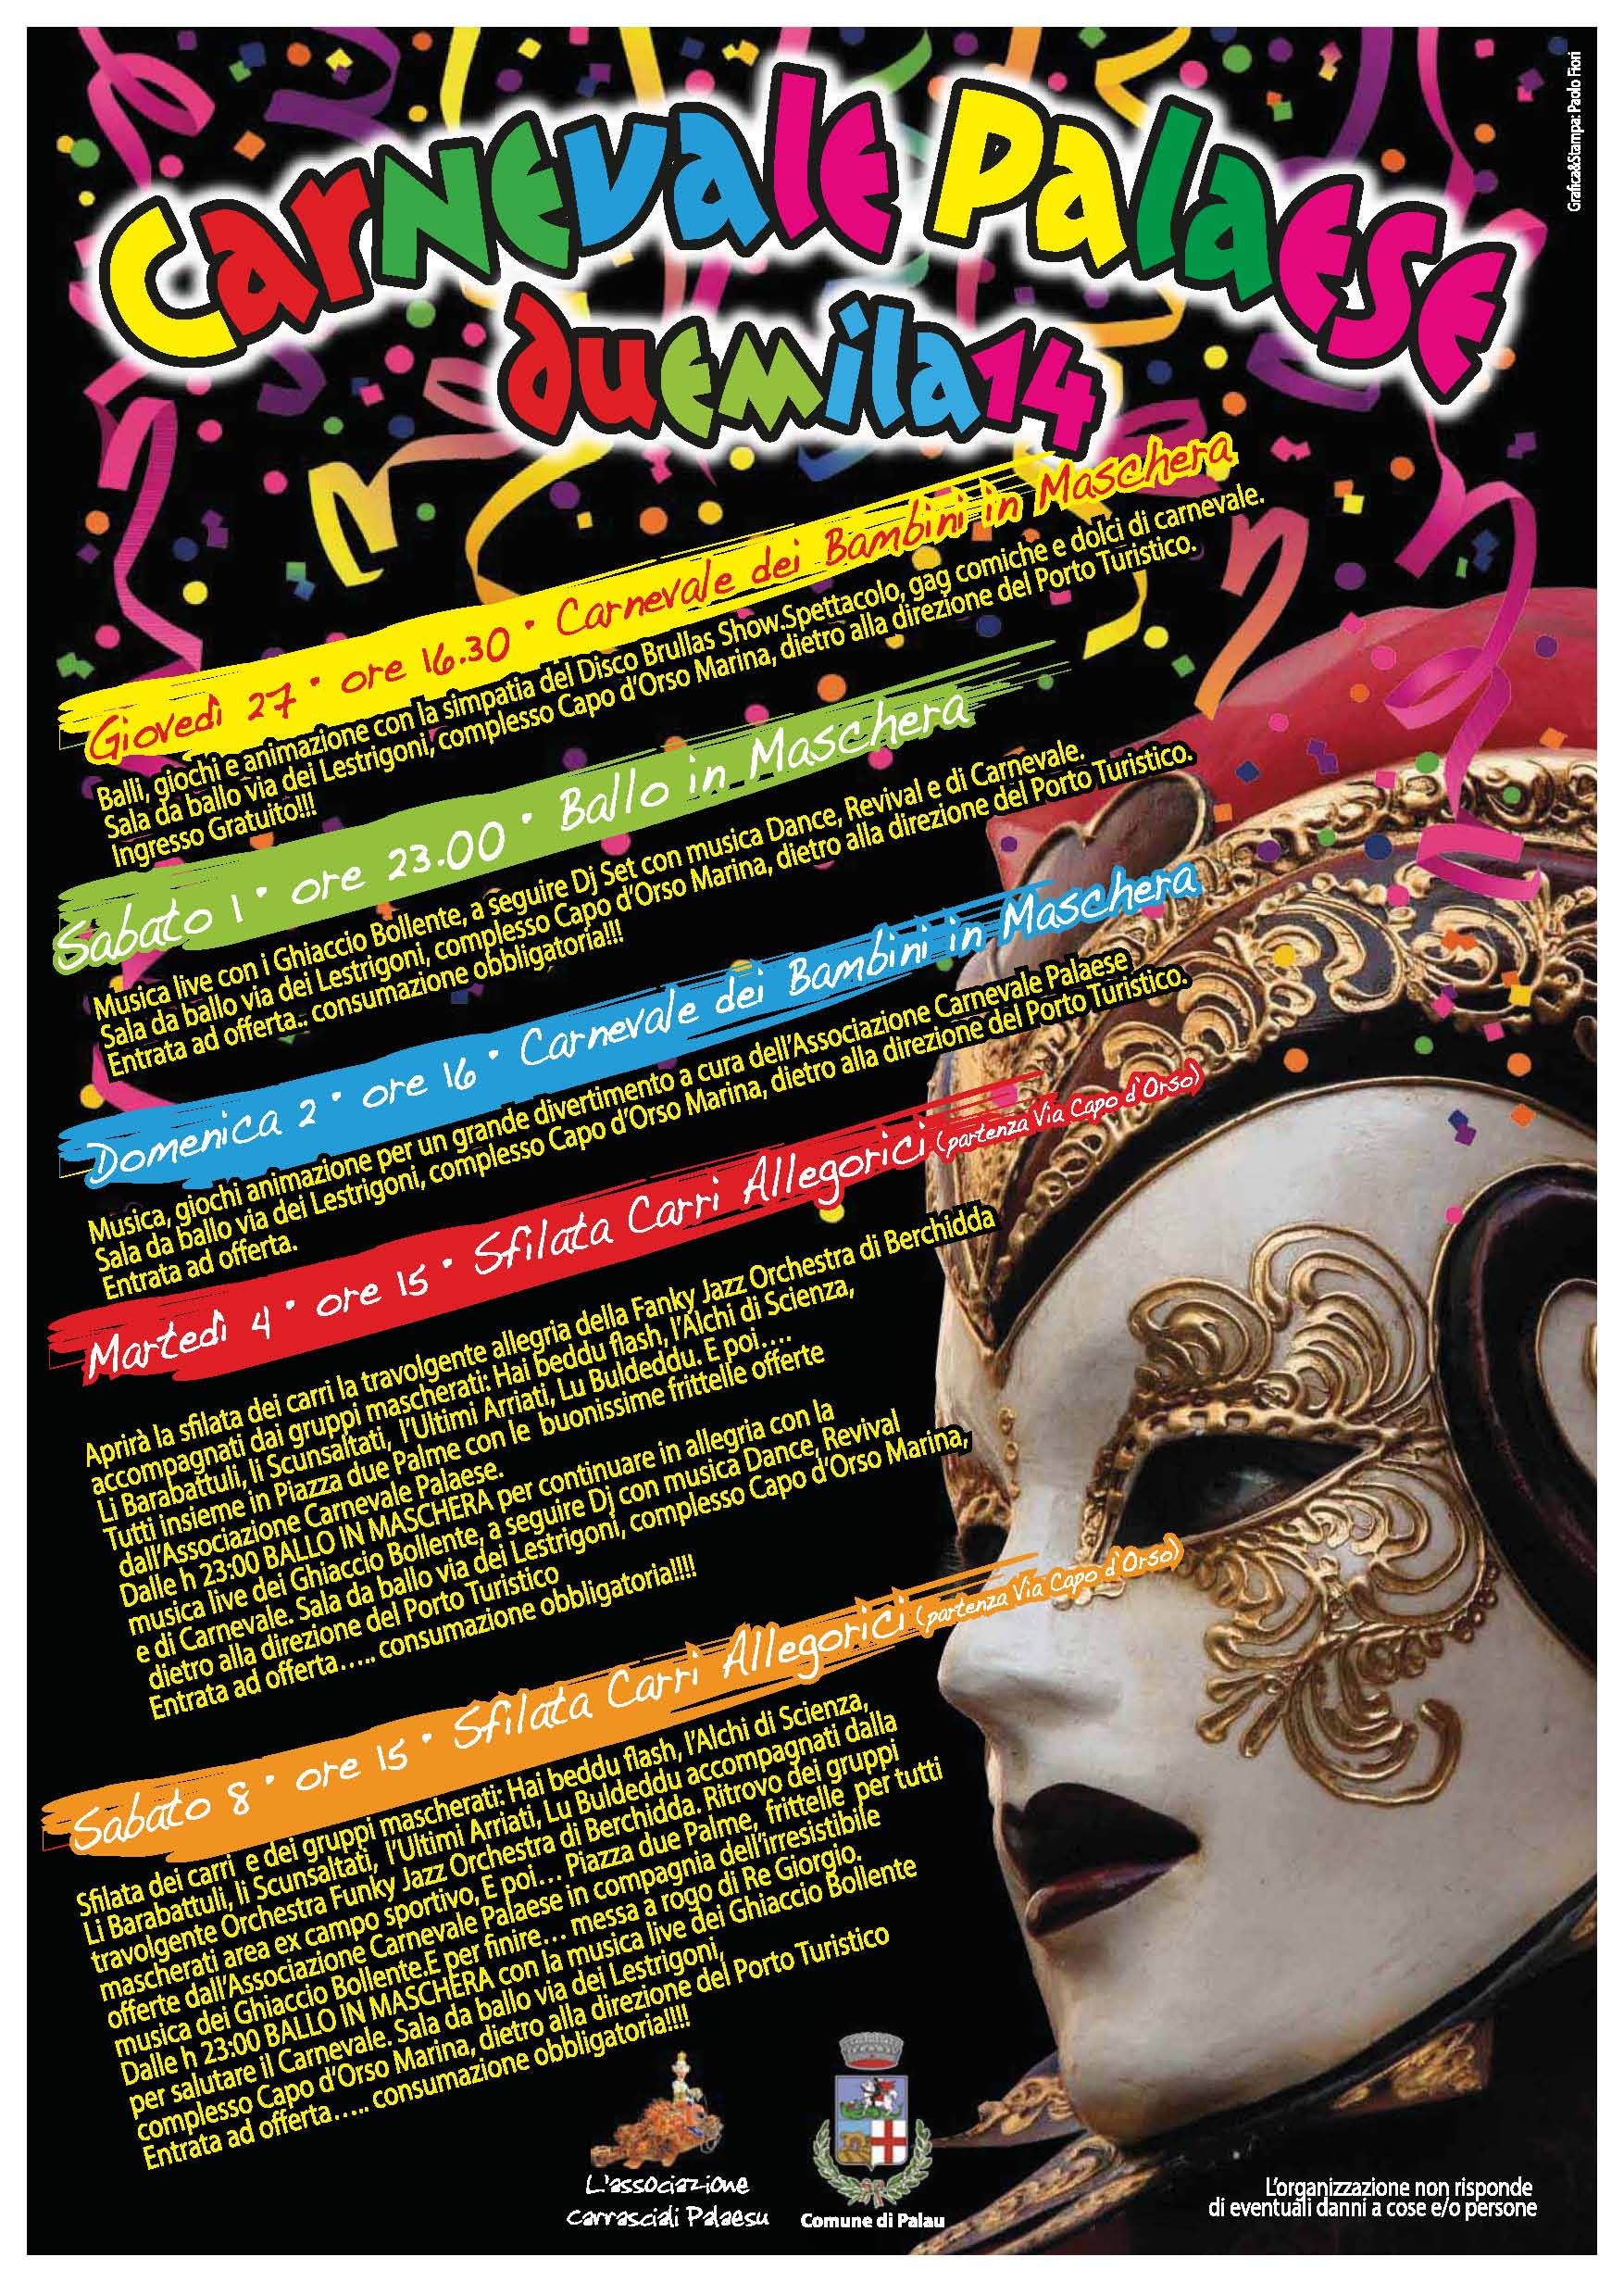 carnevale palaese 2014, programma completo carnevale di Palau 2014